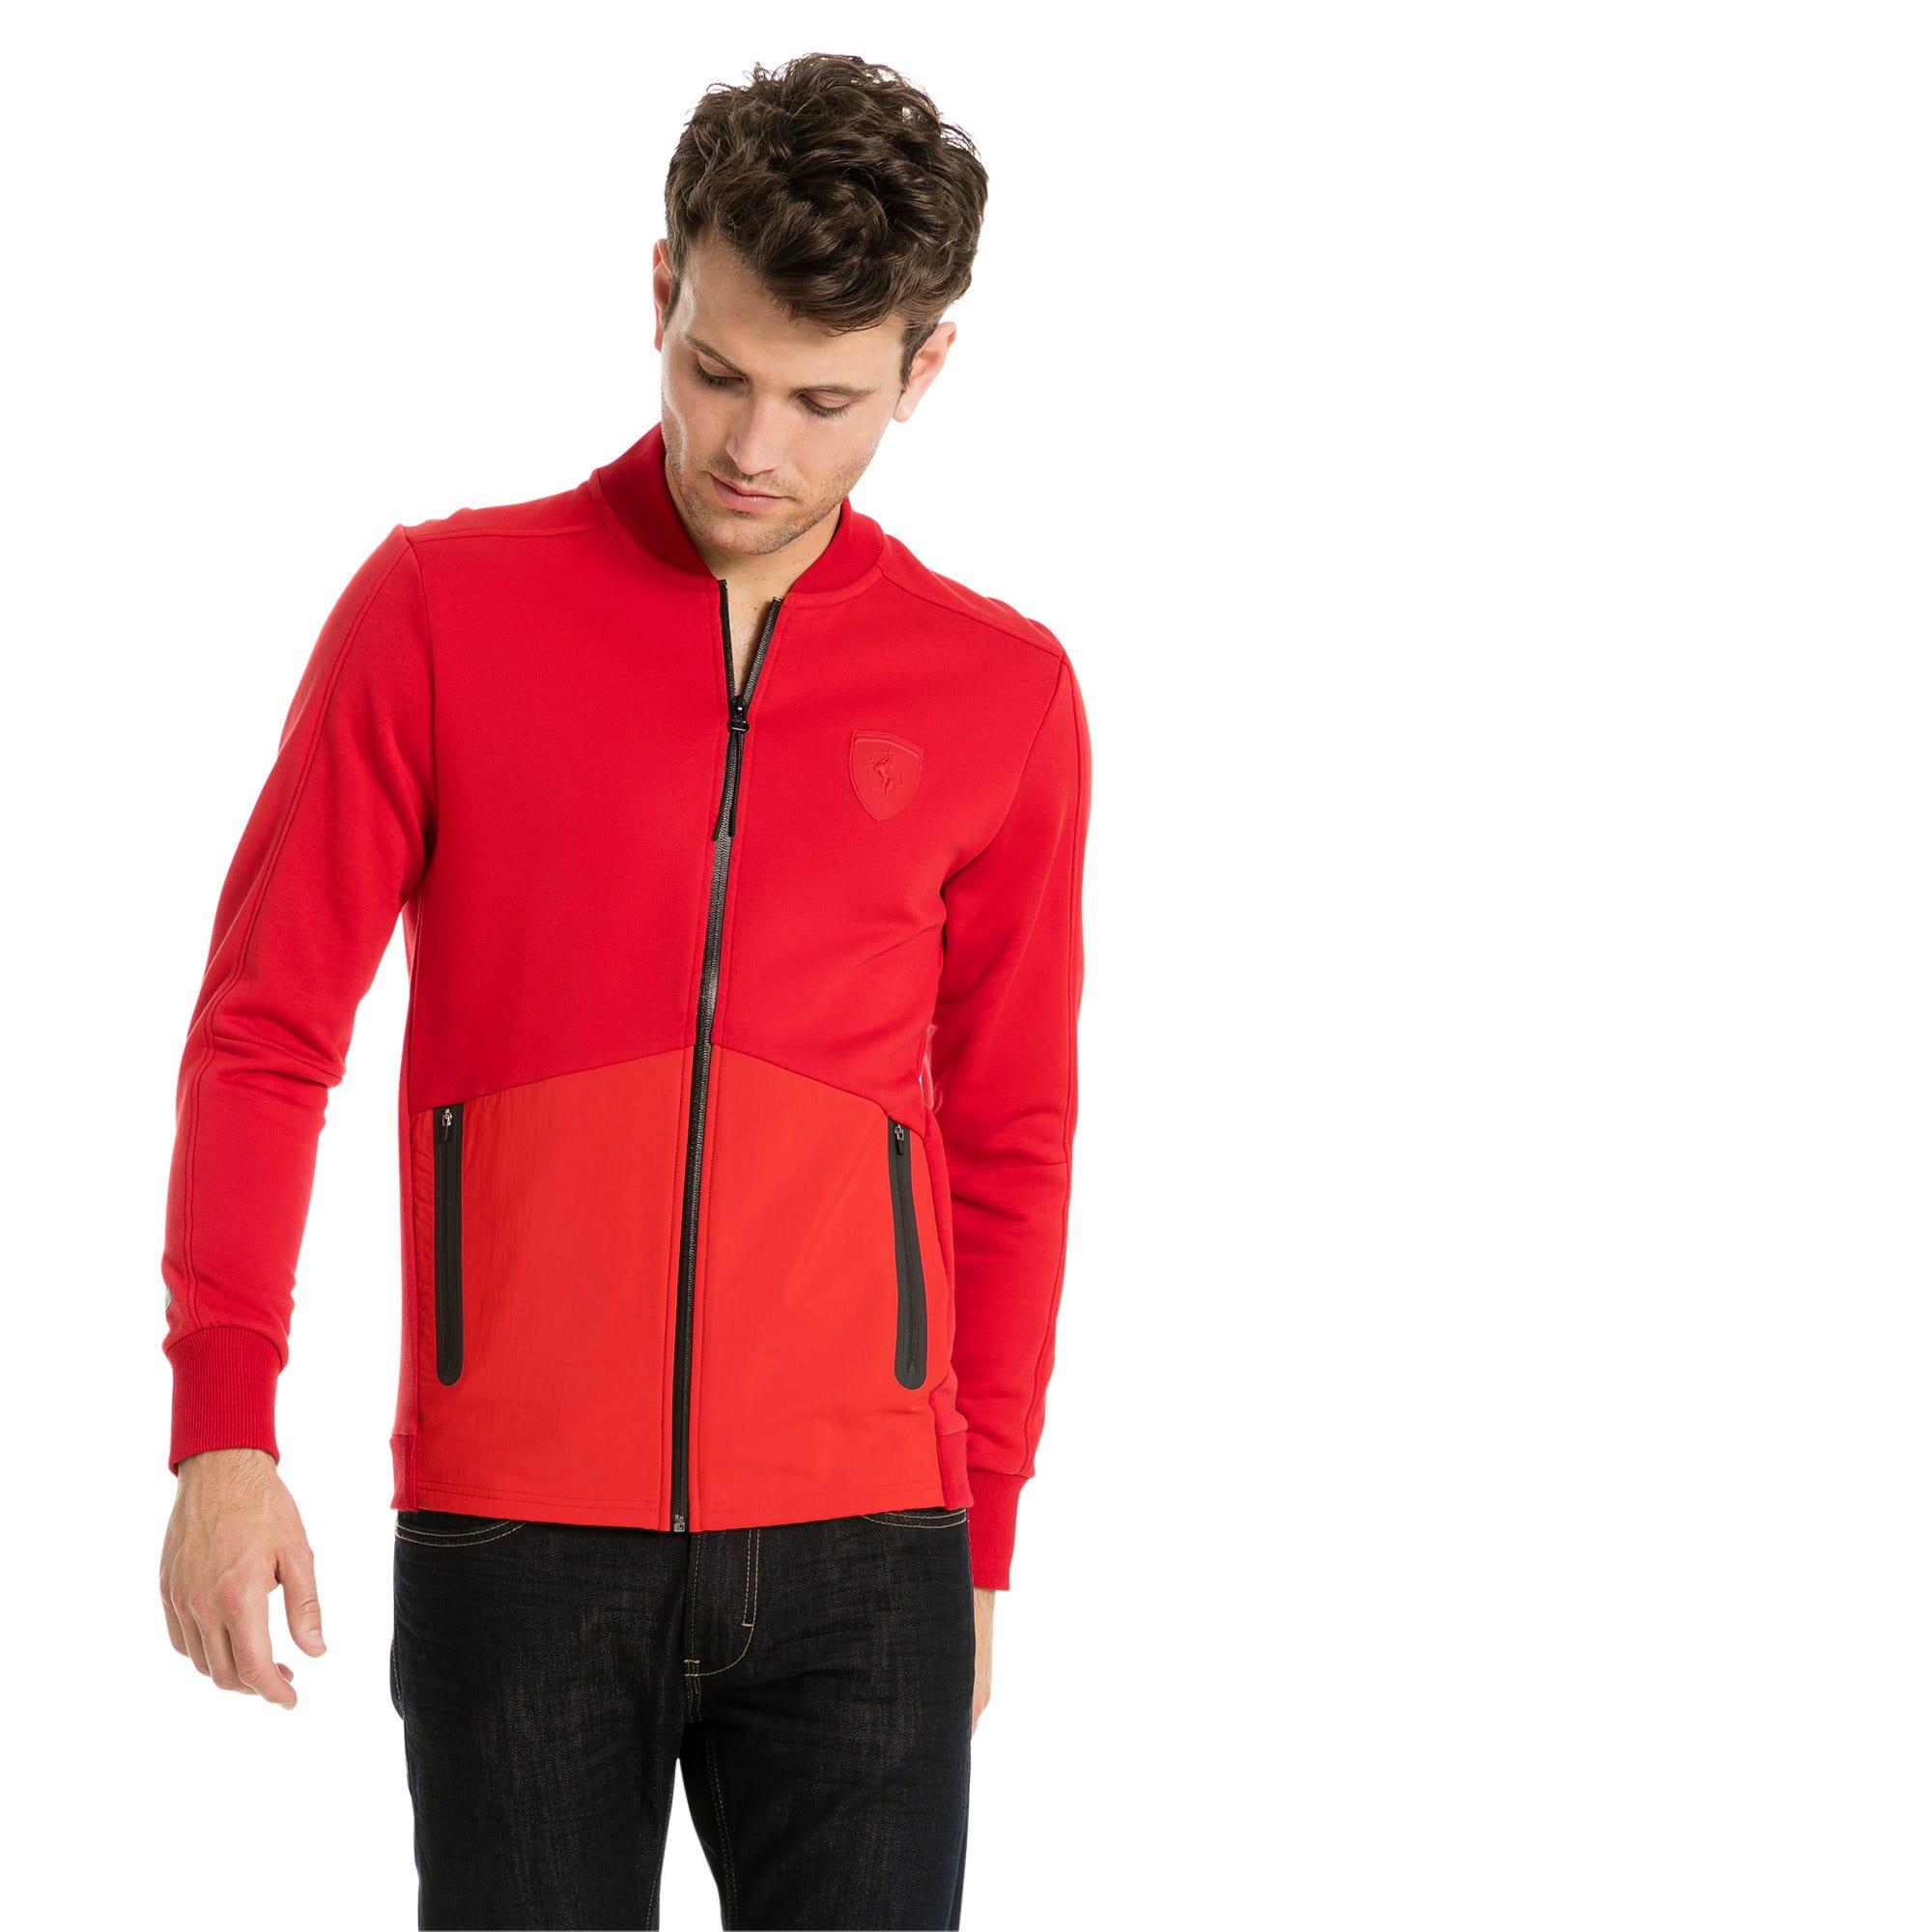 Thumbnail 2 of Ferrari Lifestyle Men's Sweat Jacket, Rosso Corsa, medium-IND